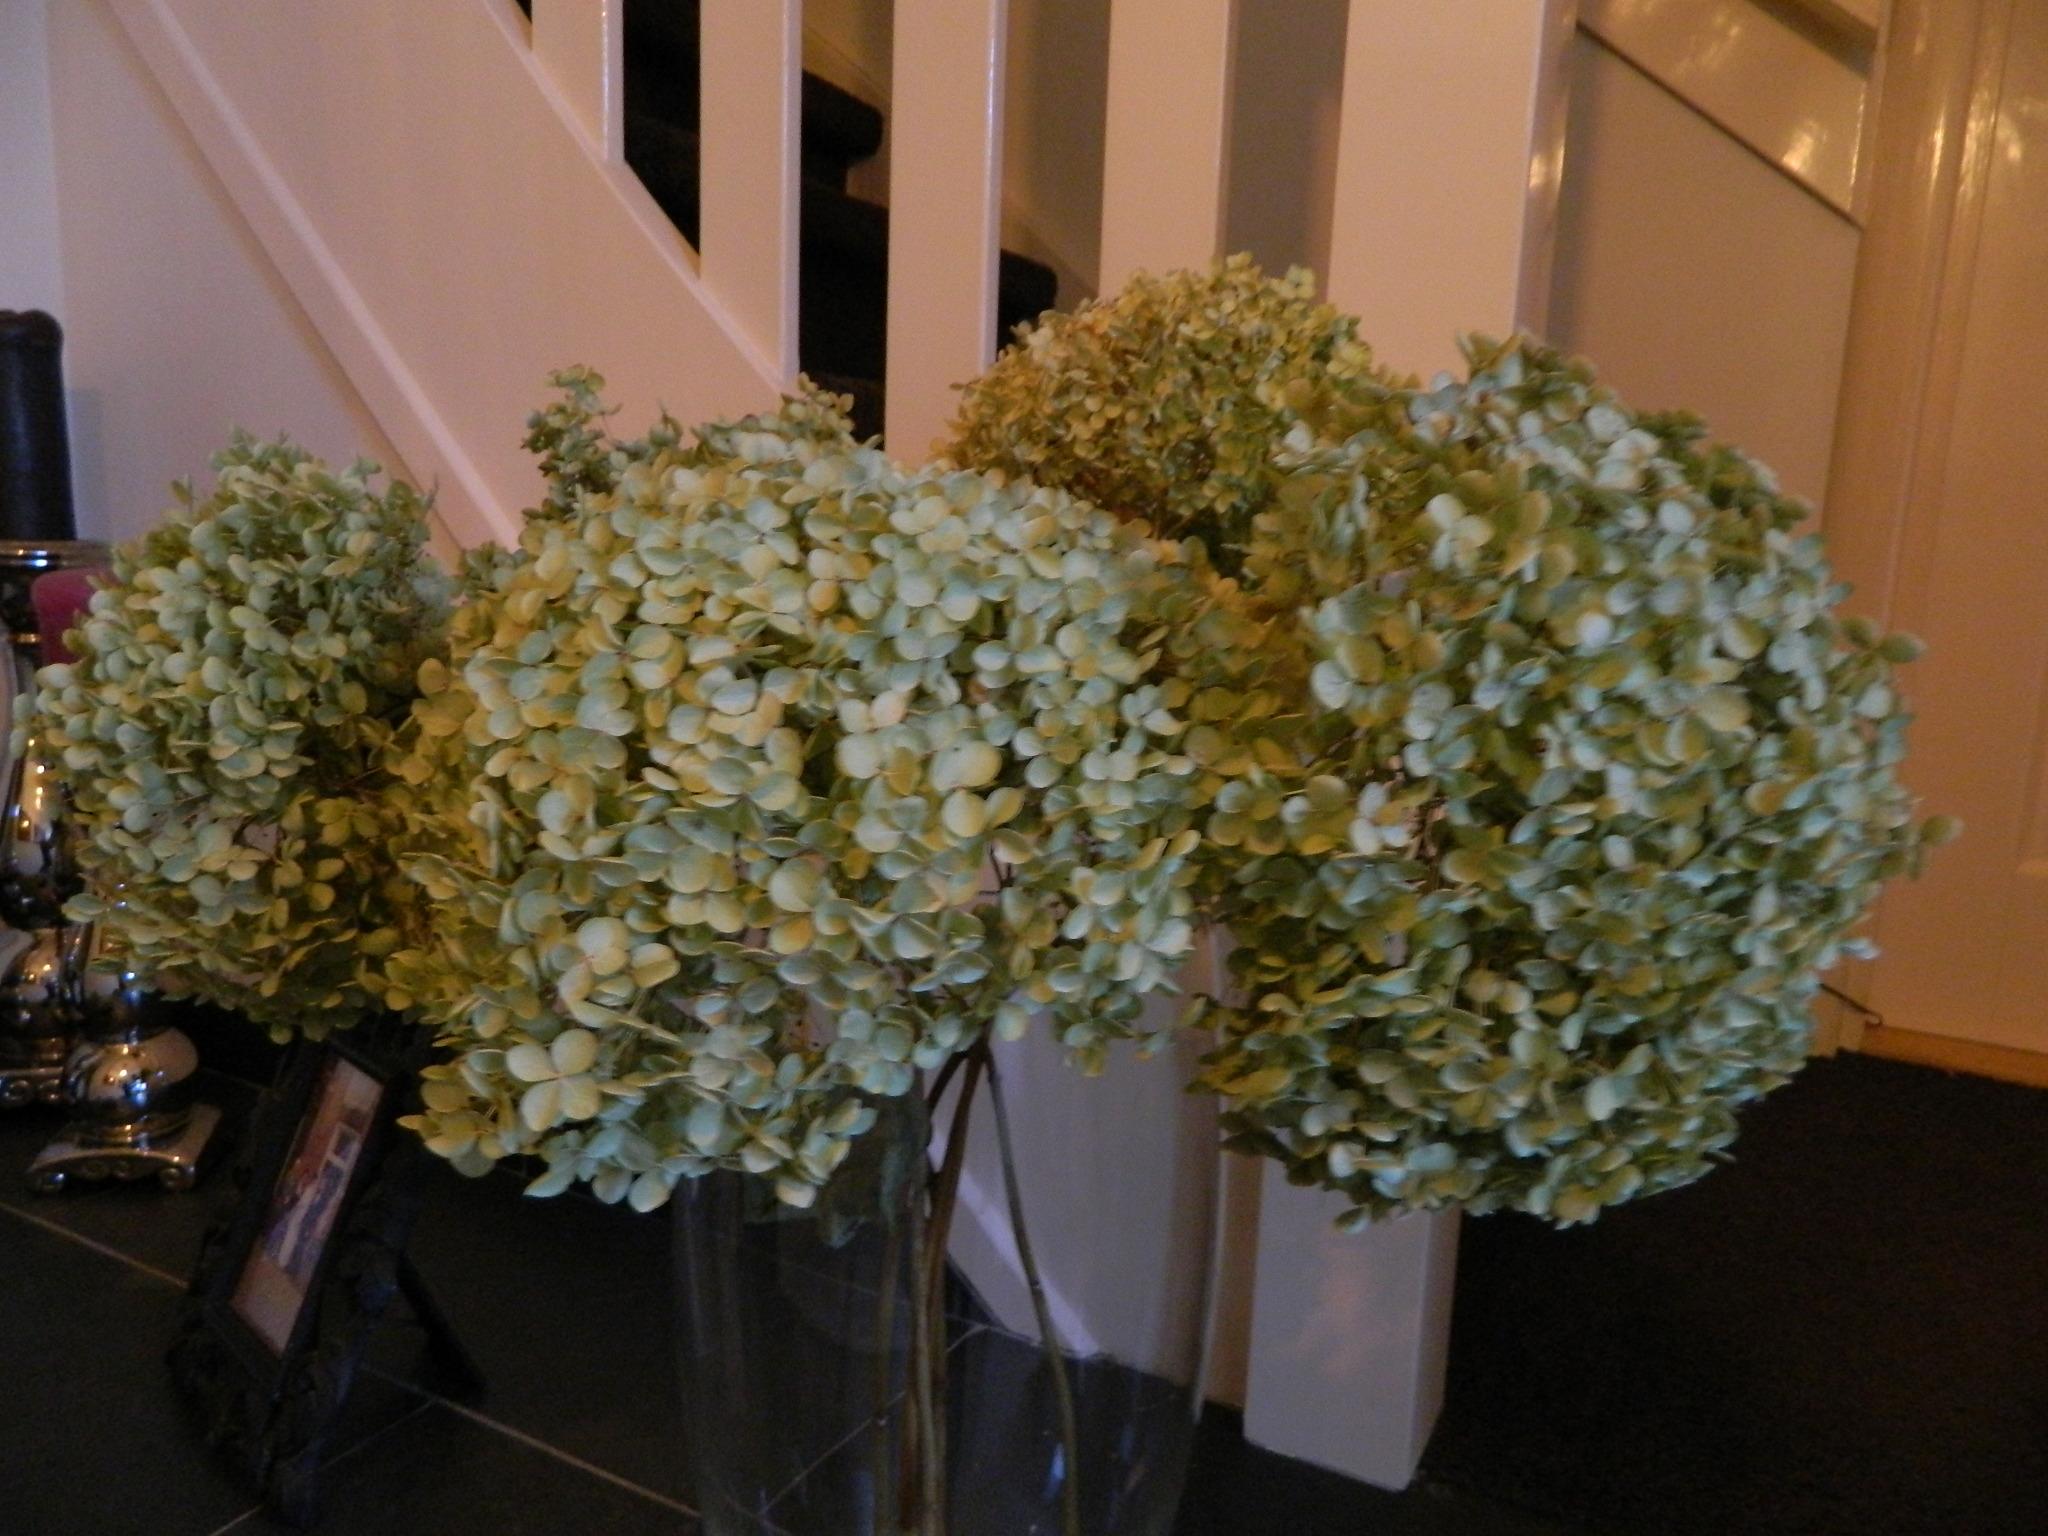 Hervorragend Trockenblumen - UN81